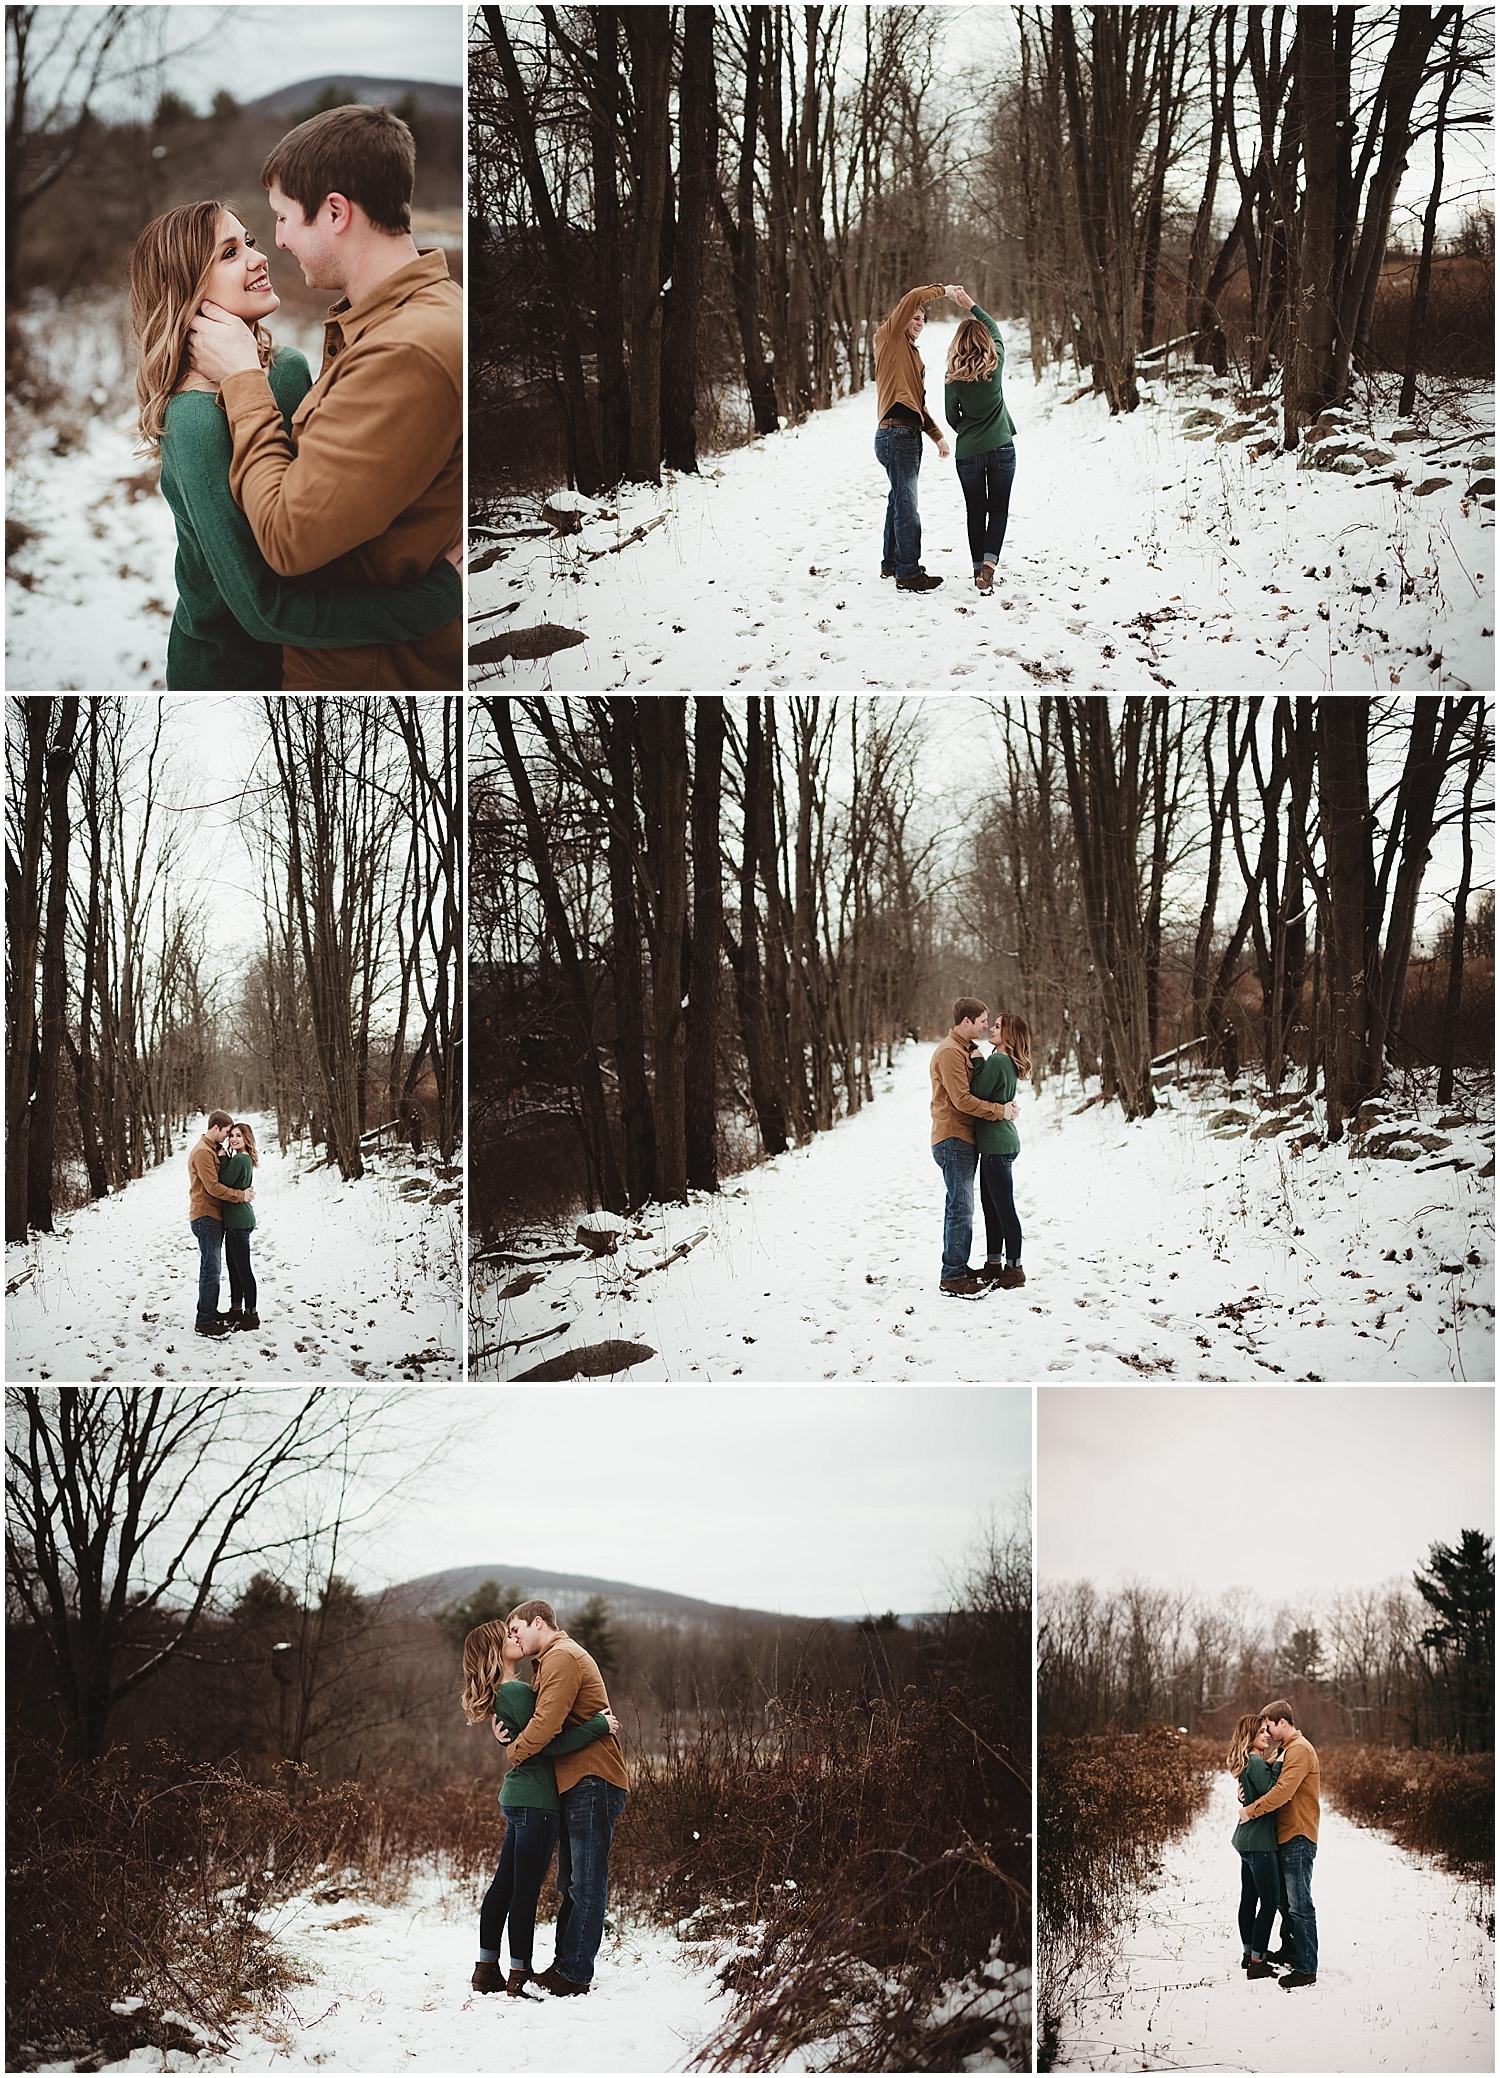 NEPA-Scranton-wedding-engagement-photographer-in-Lock-Haven-PA-Central-PA_0139.jpg